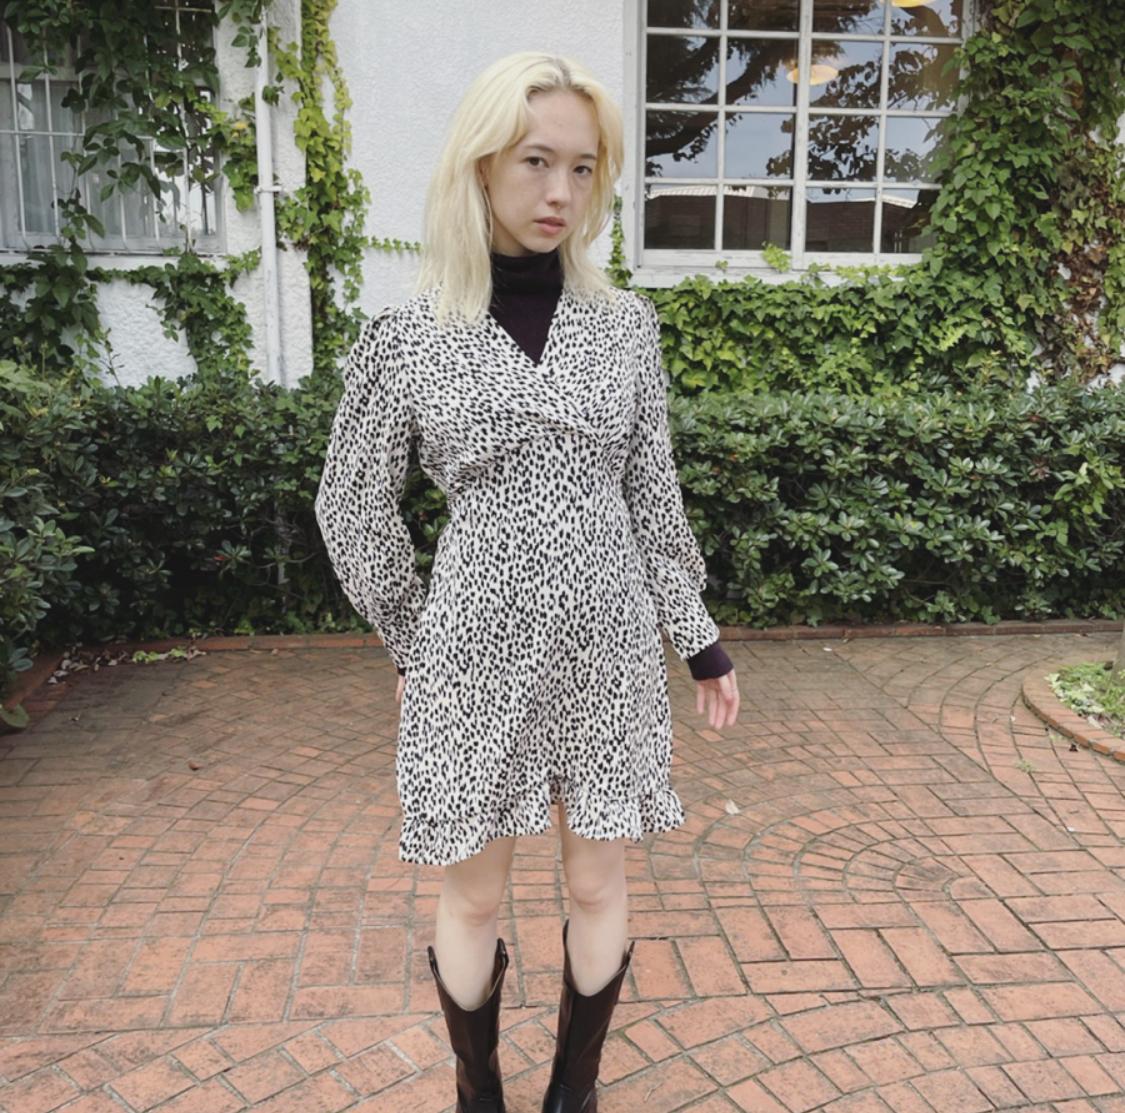 【ASHLEY】leopard one piece